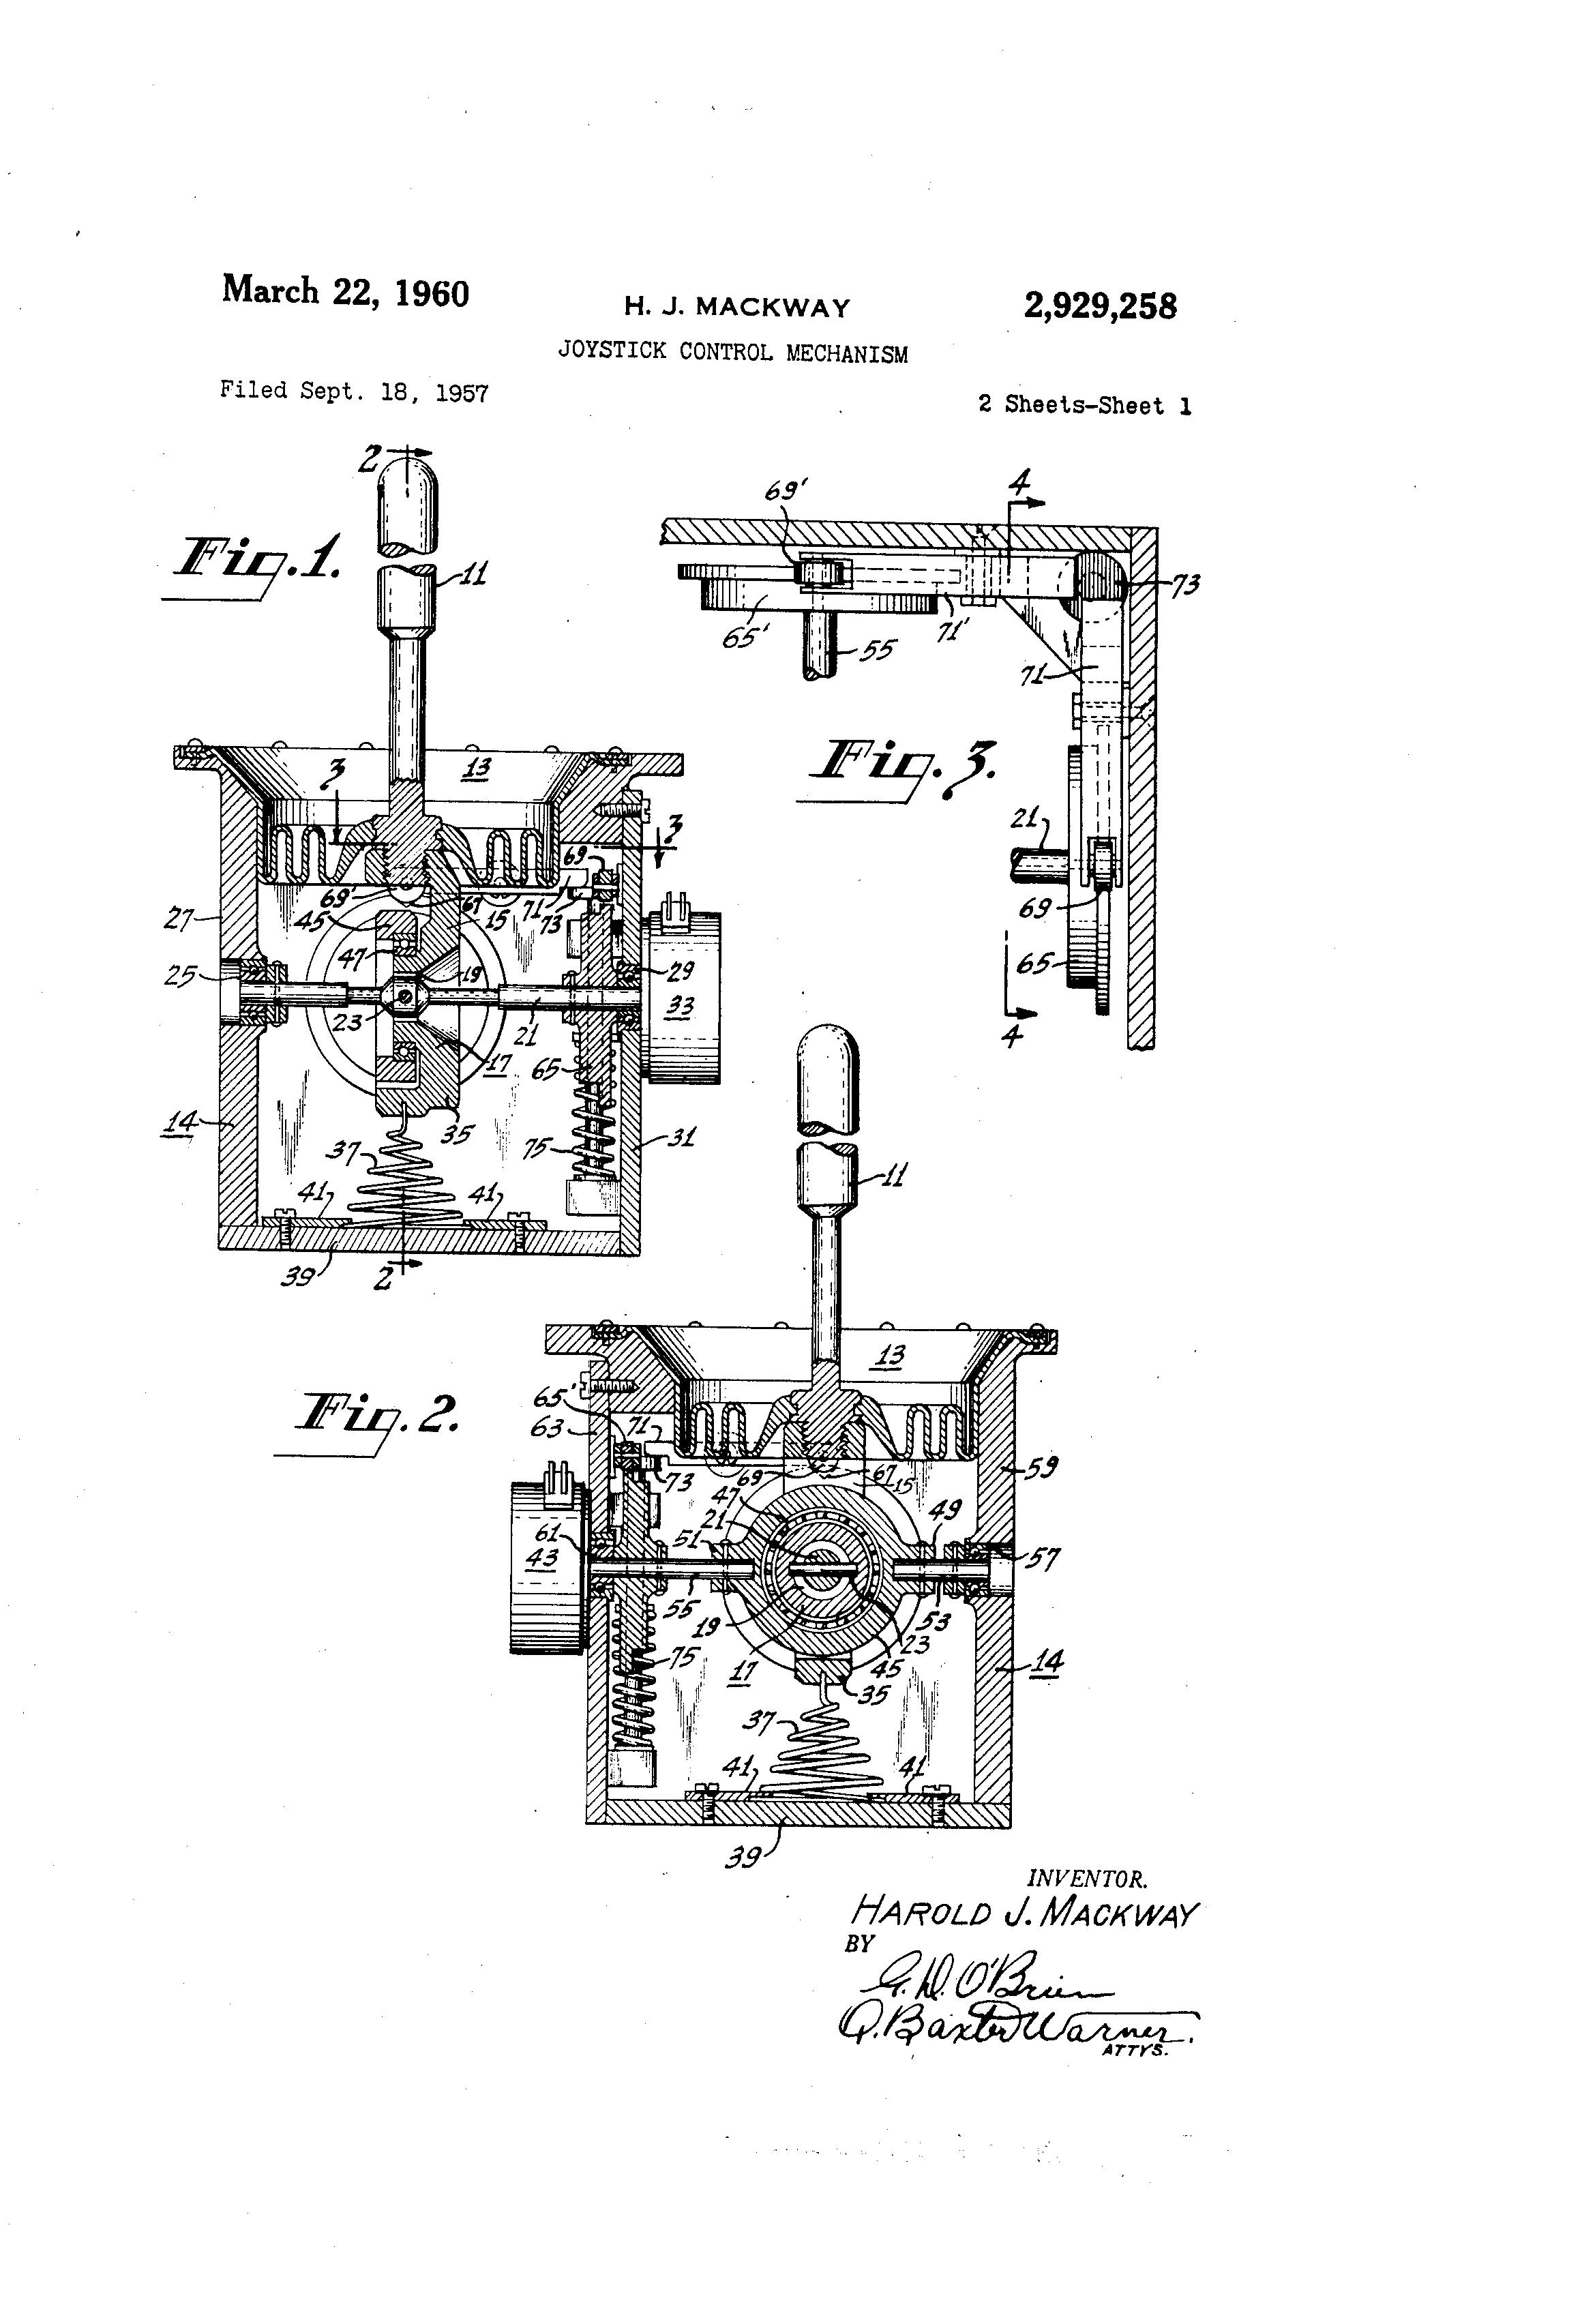 patent us2929258 - joystick control mechanism